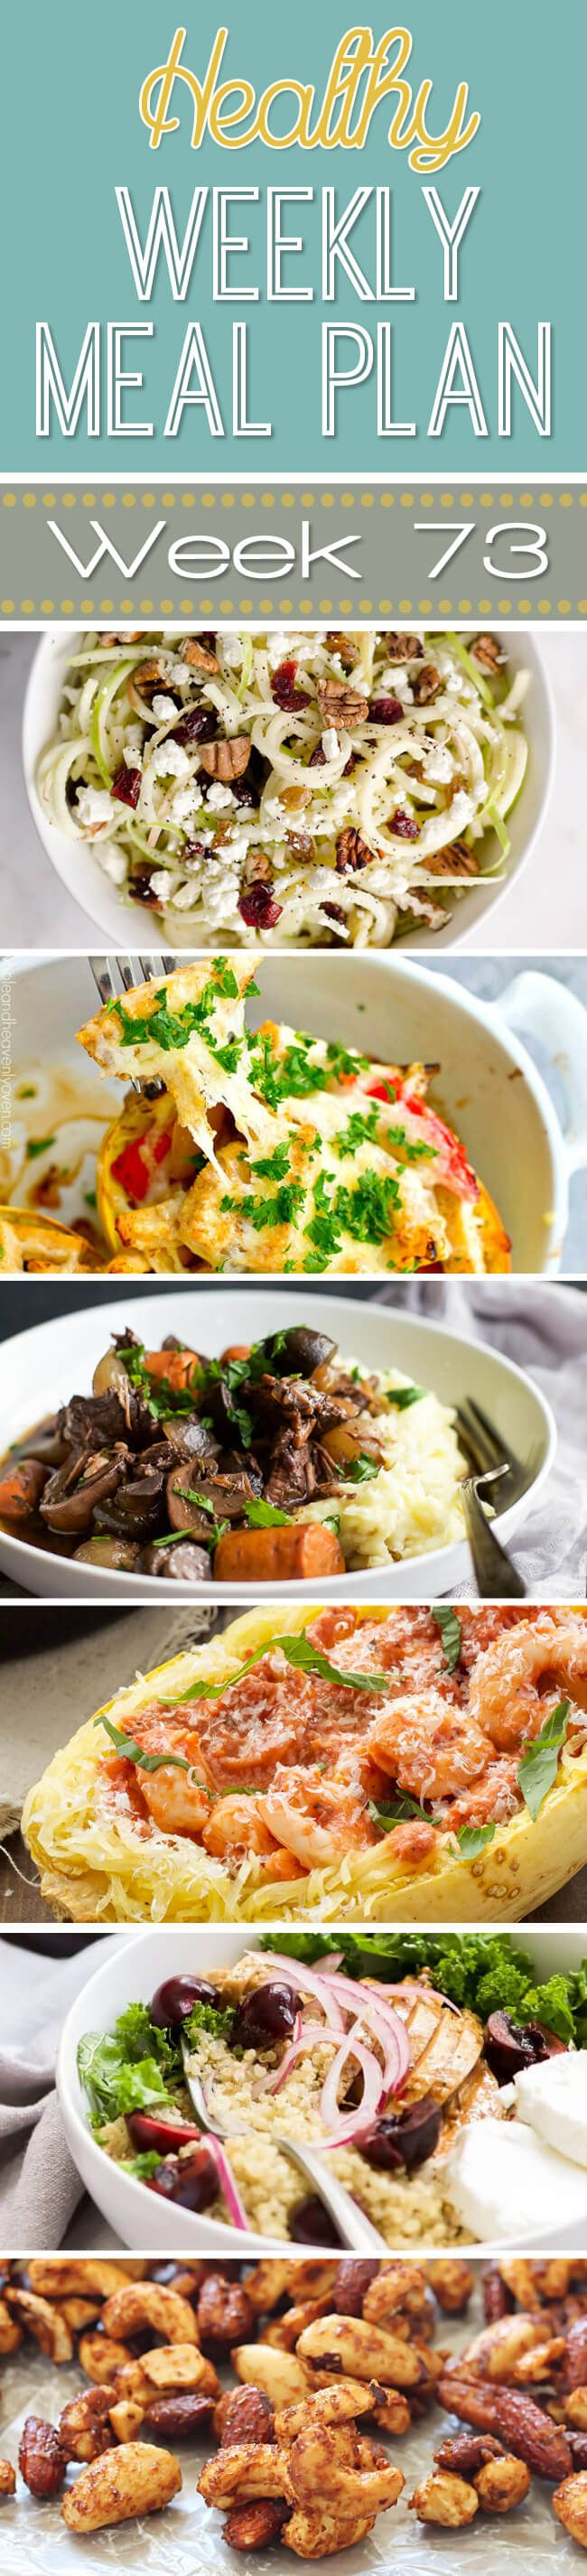 Healthy Weekly Meal Plan #73